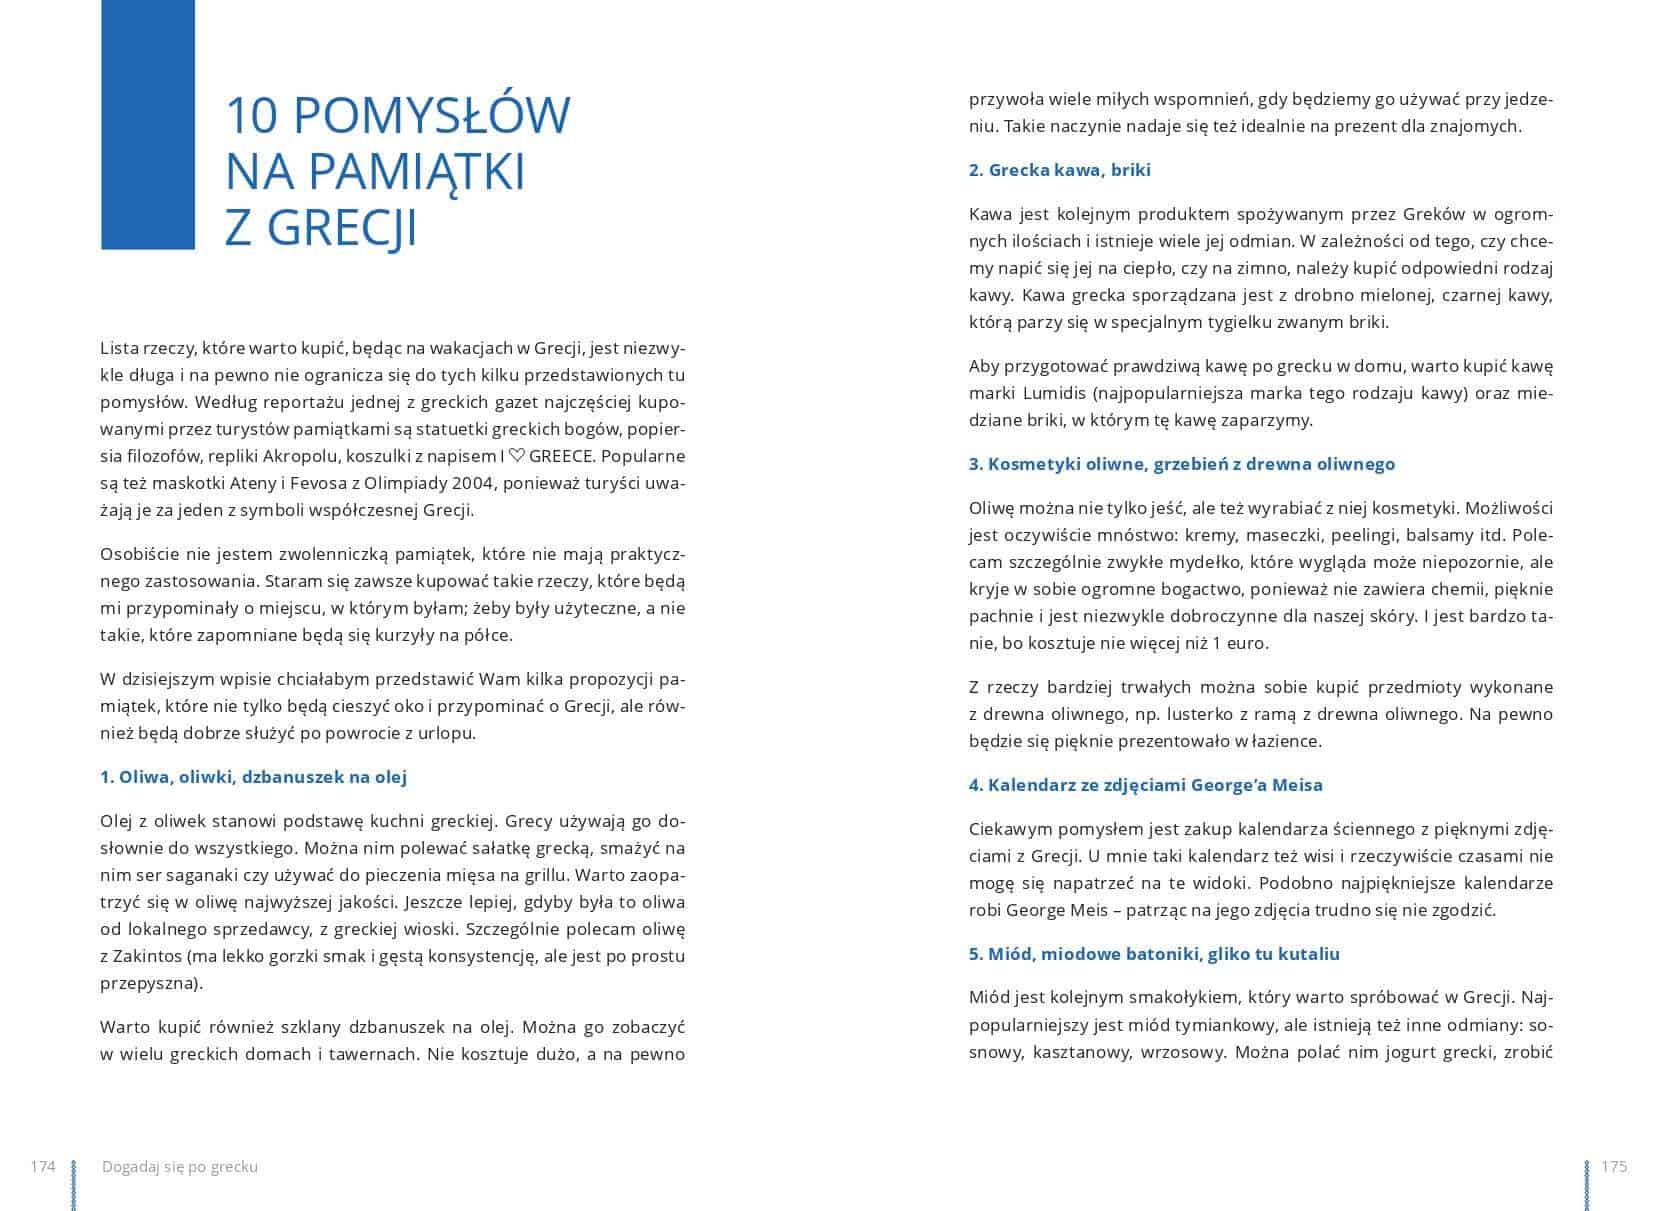 Dogadaj_sie_po_grecku_Sklad_140_205_05_final_page-0088